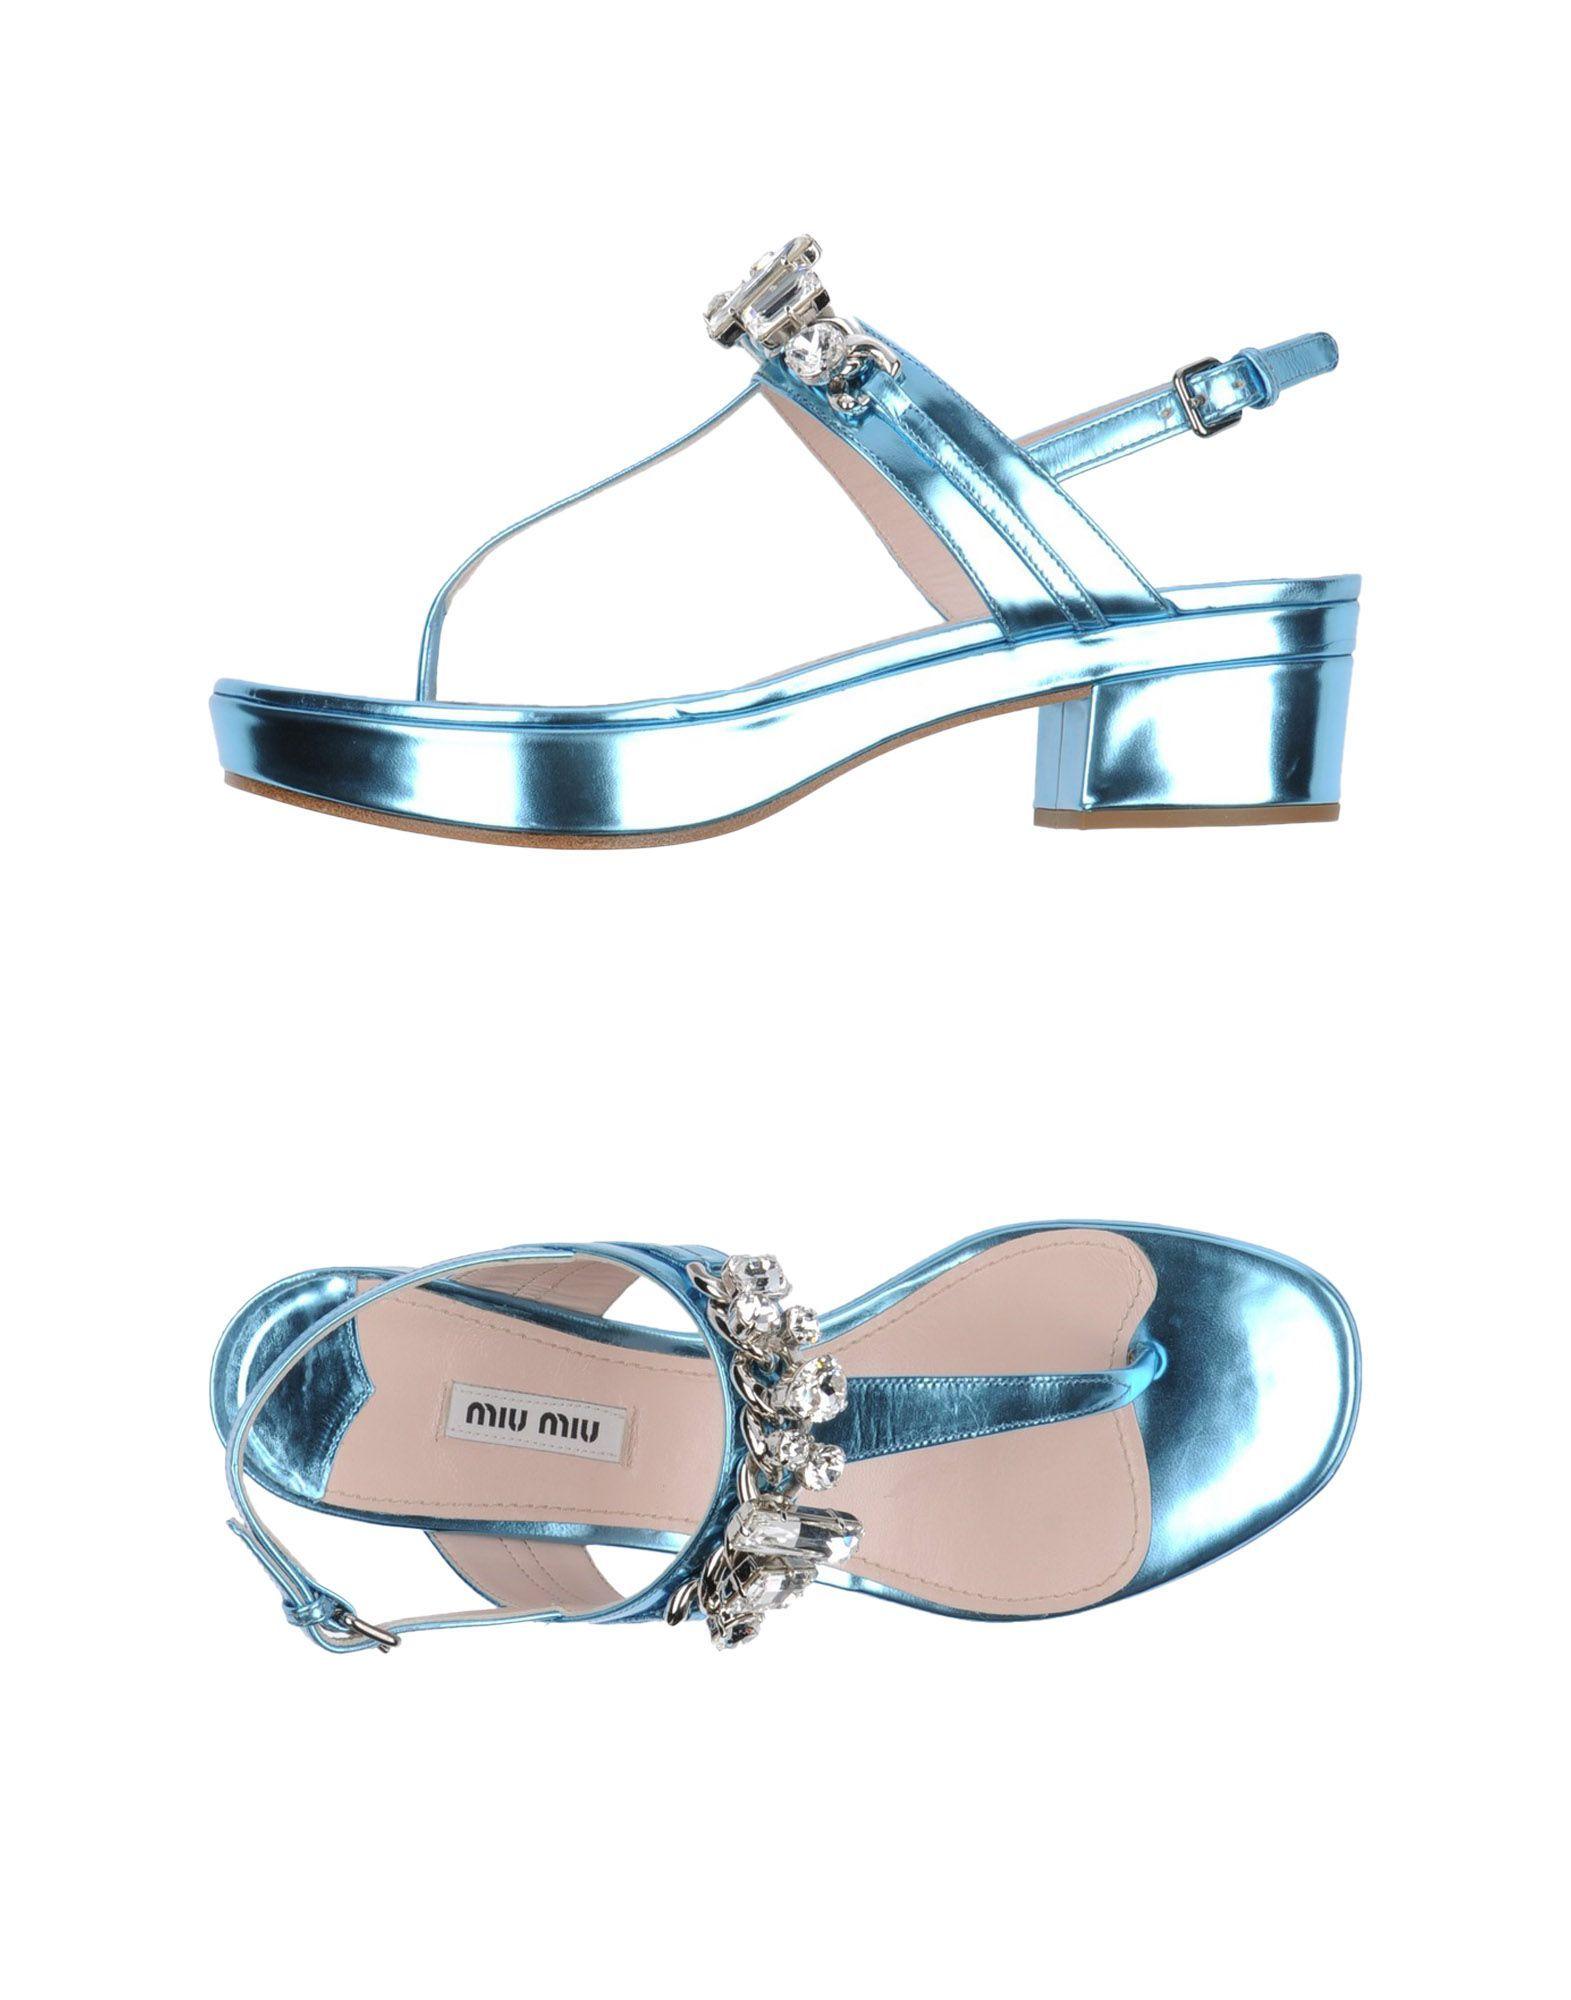 58cd0313da6a Miu Miu Sandals - Women Miu Miu Sandals online on YOOX United States ...